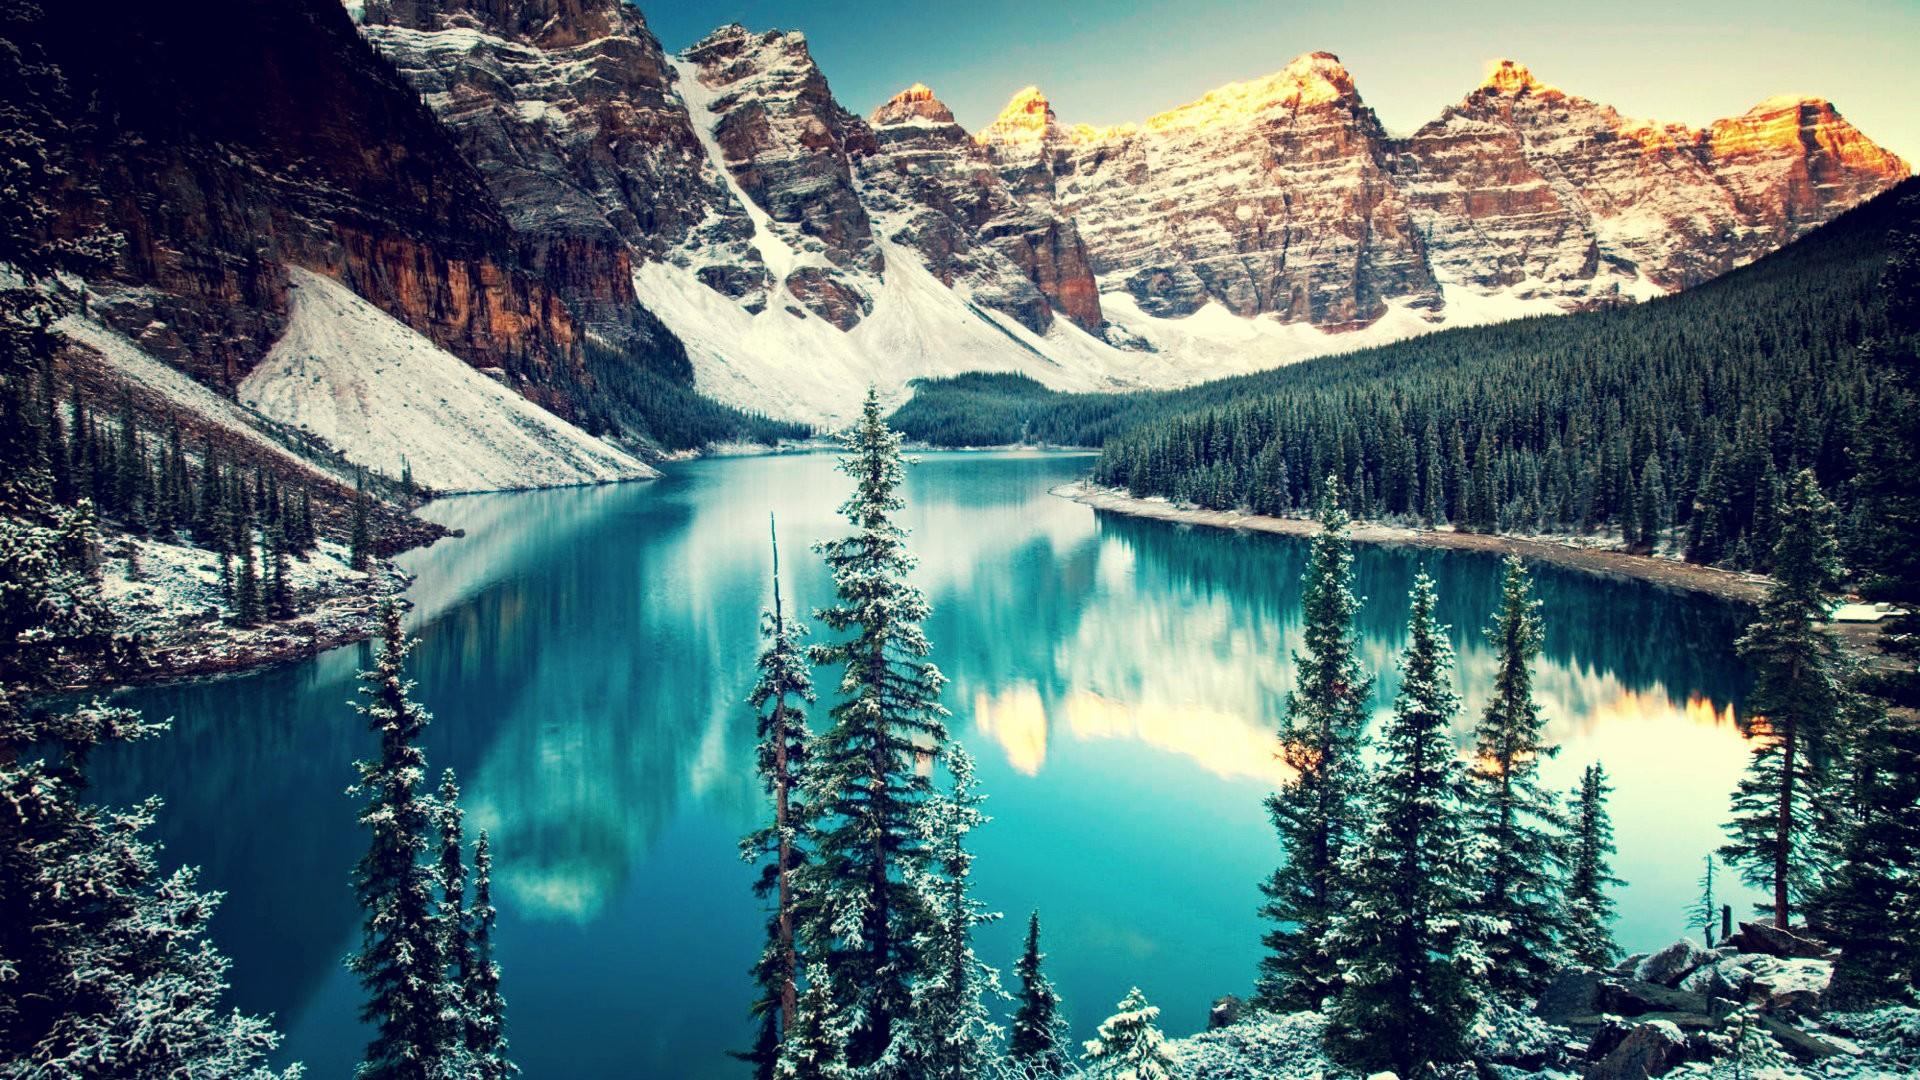 Beautiful Wallpaper Mountain Asus - 456496  Image_259296.jpg